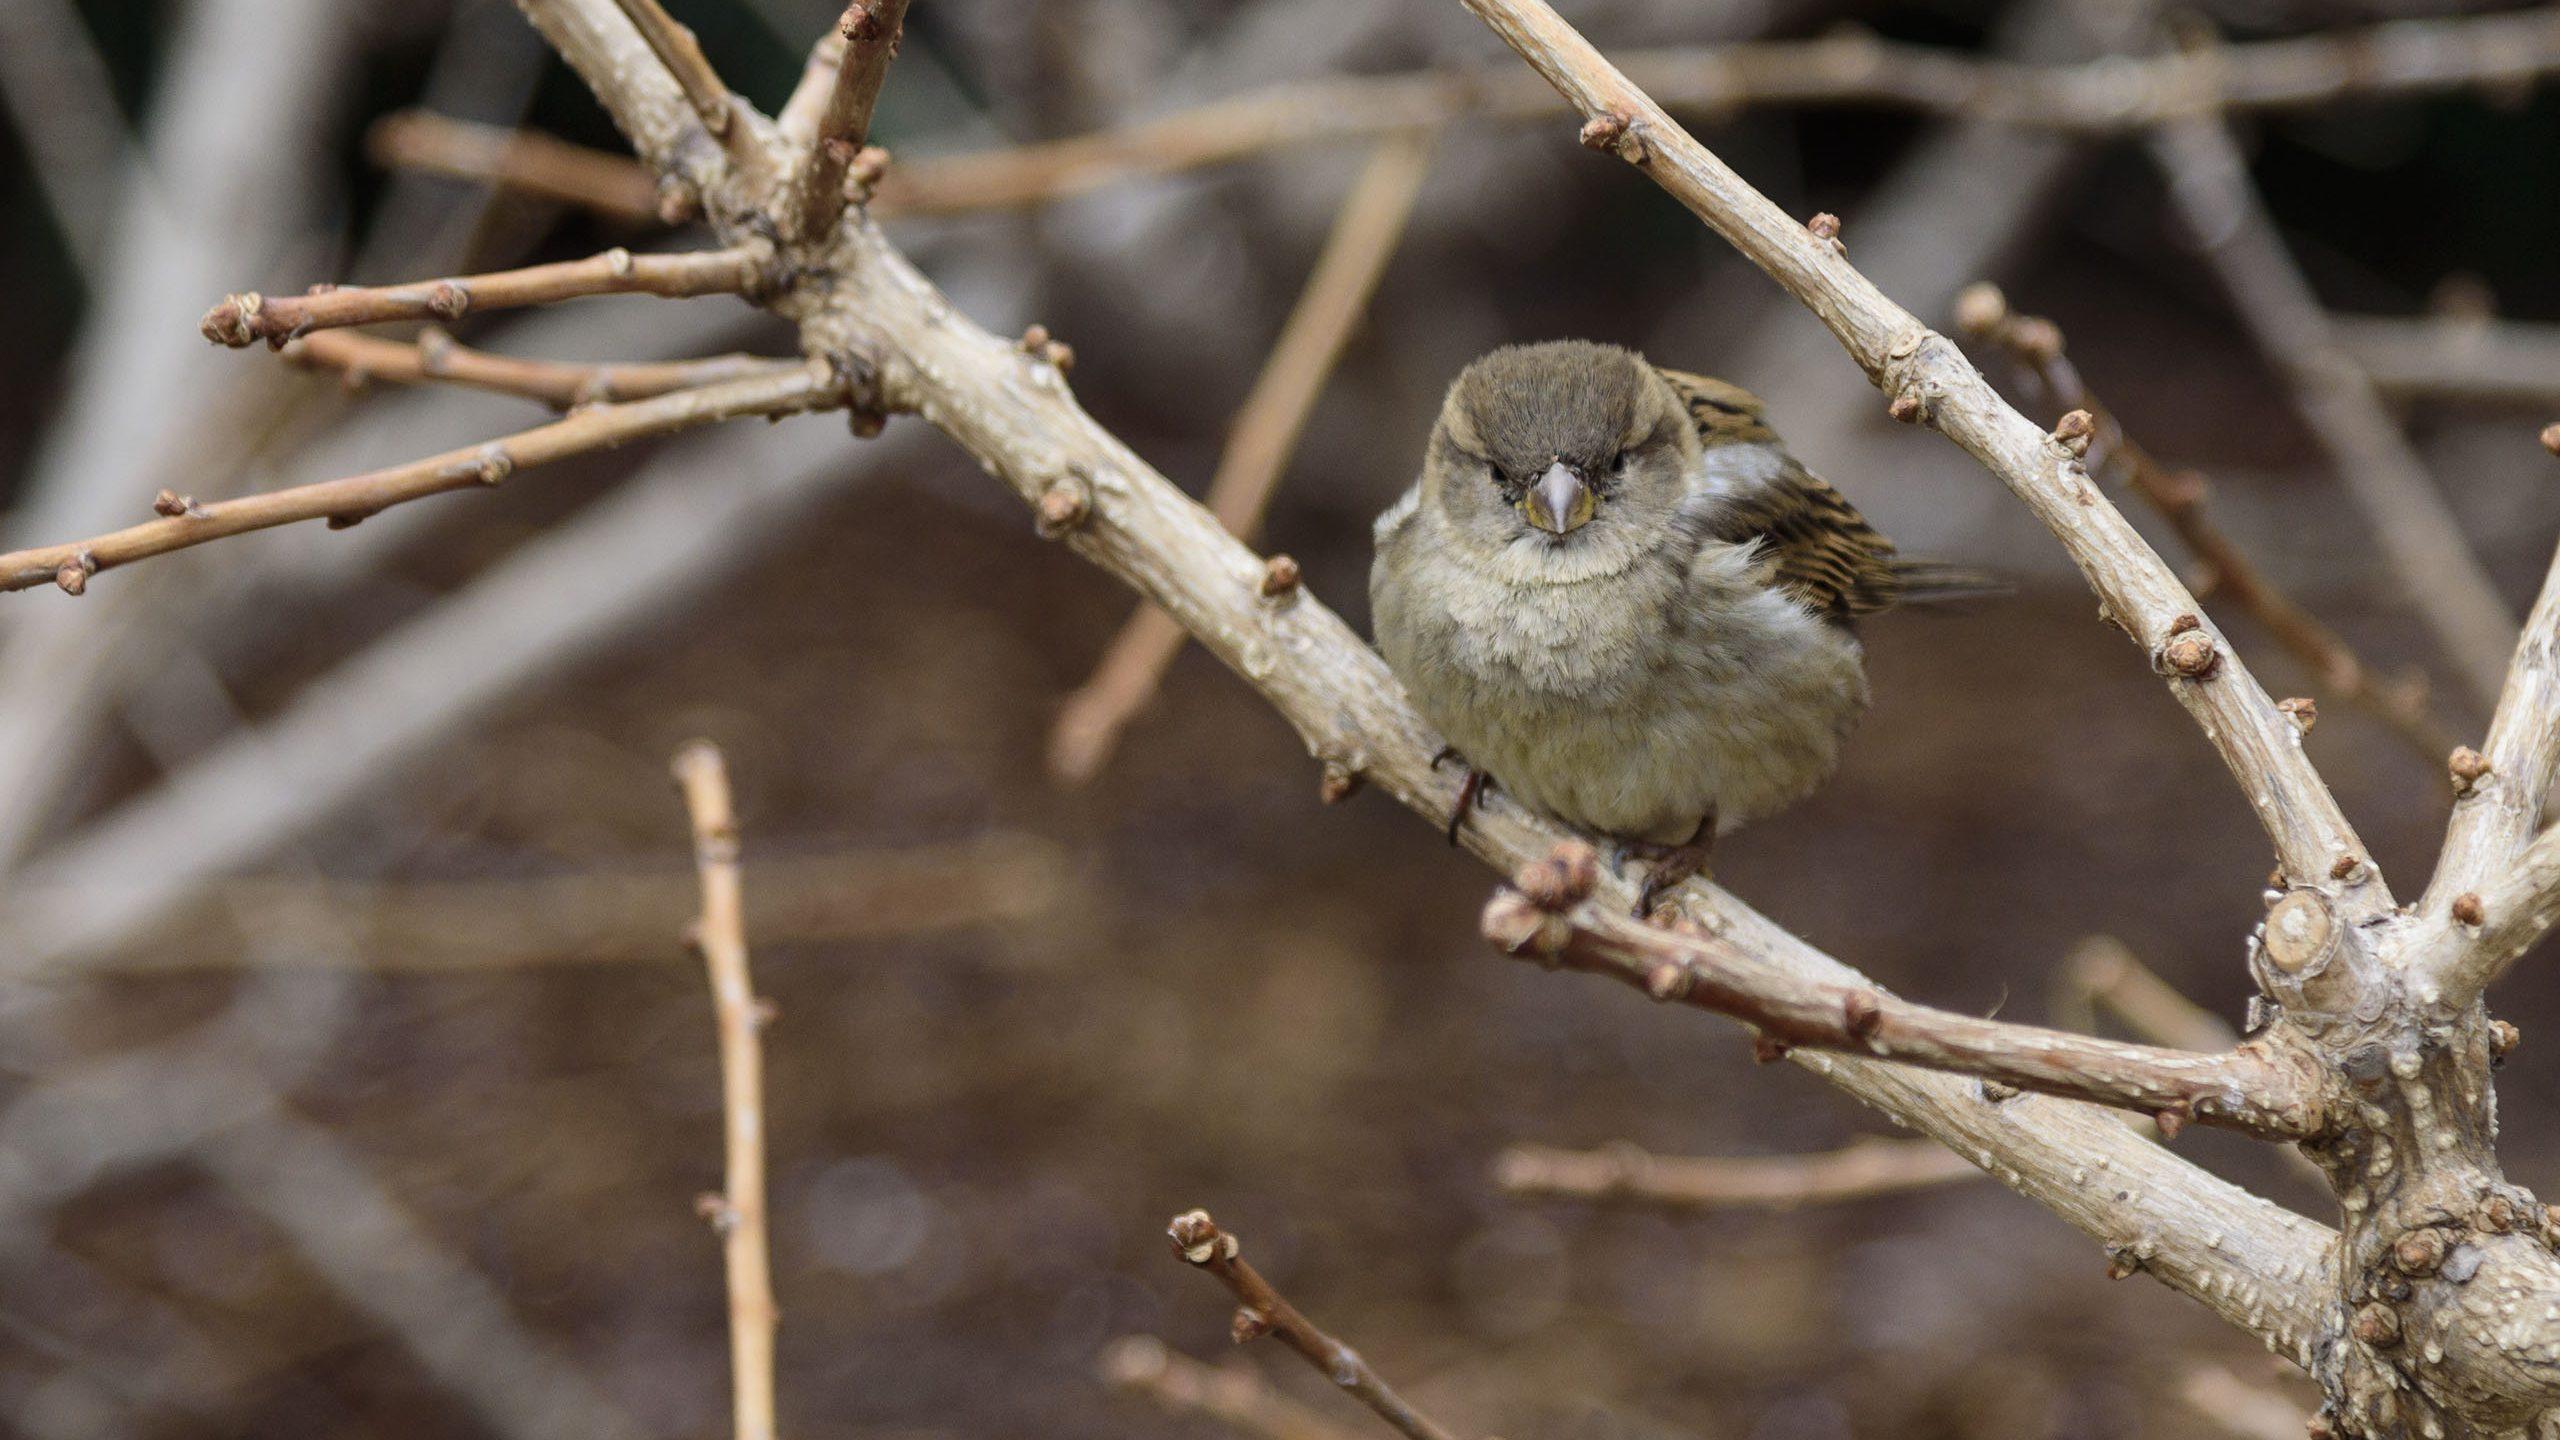 Urban Bird Habitat Garden at the National Museum of Natural History